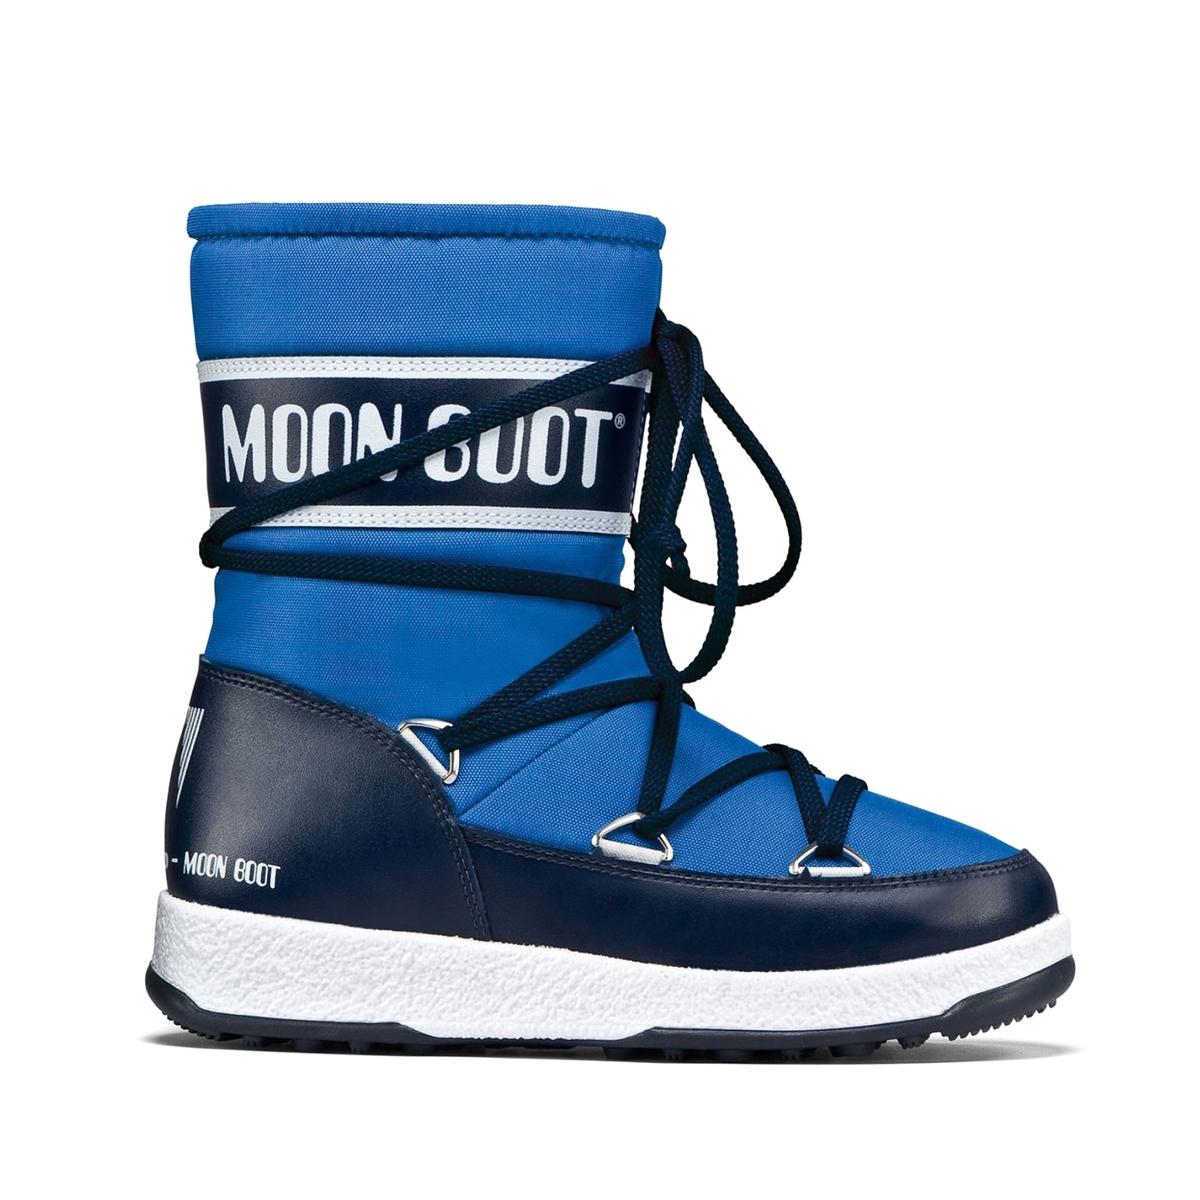 Сапоги WE SPORT MID JR moon boot лыжная одежда